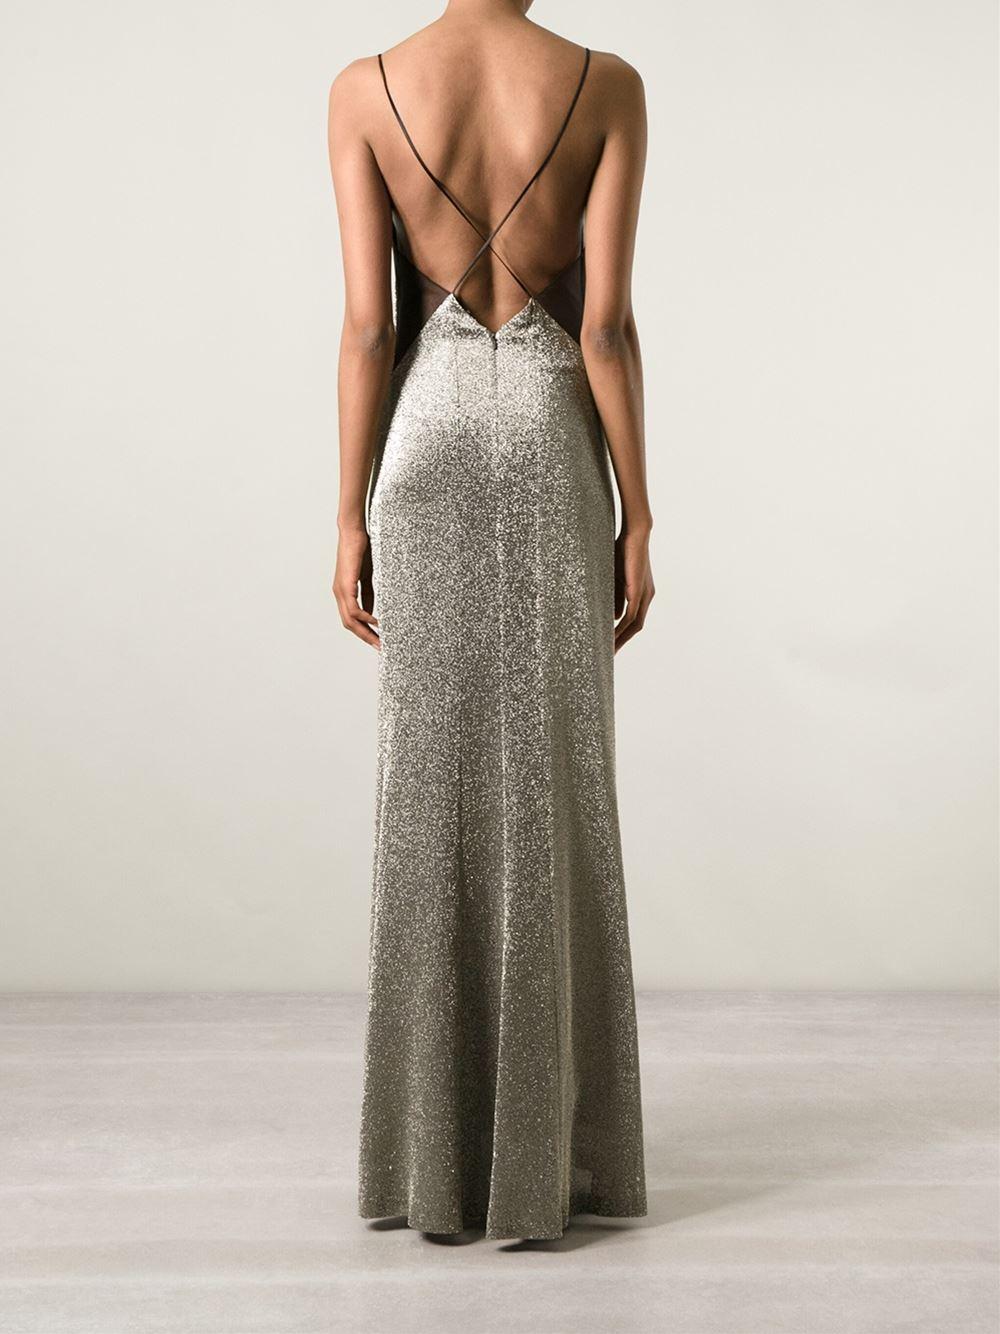 Lyst - Galvan London Metallic Slip Evening Dress in Metallic